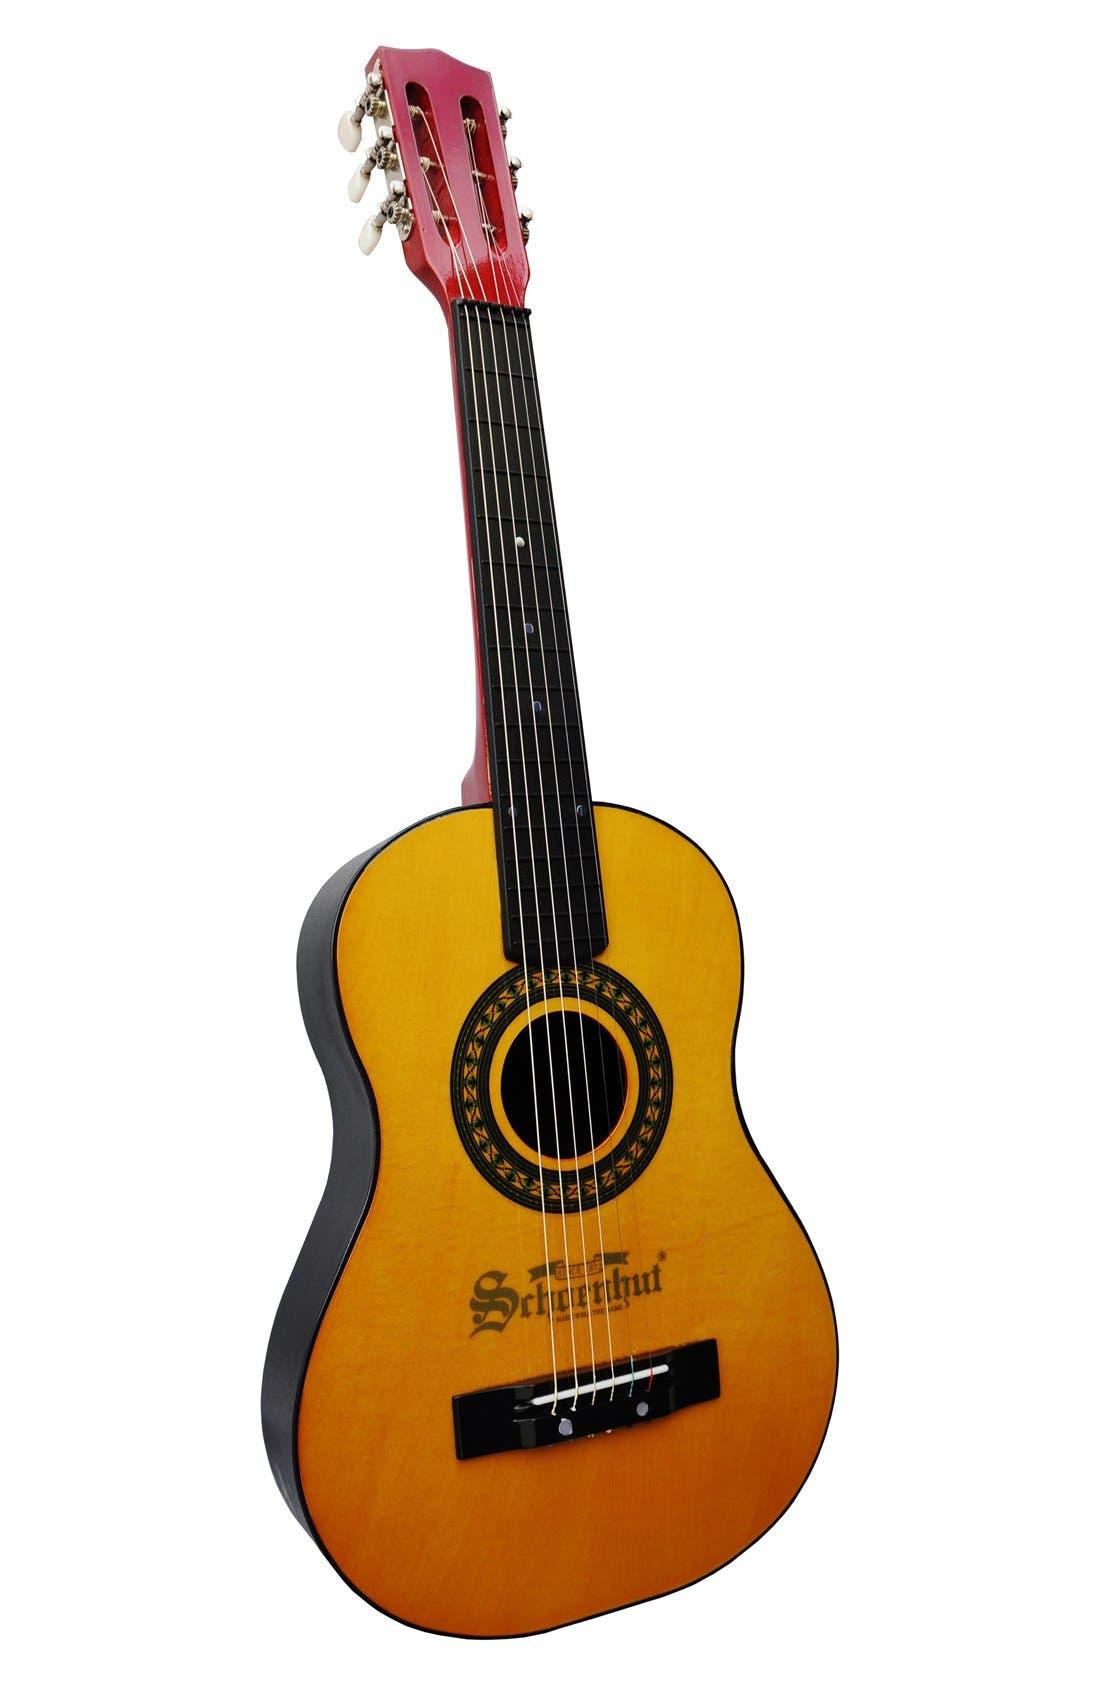 Toddler Schoenhut SixString Acoustic Guitar